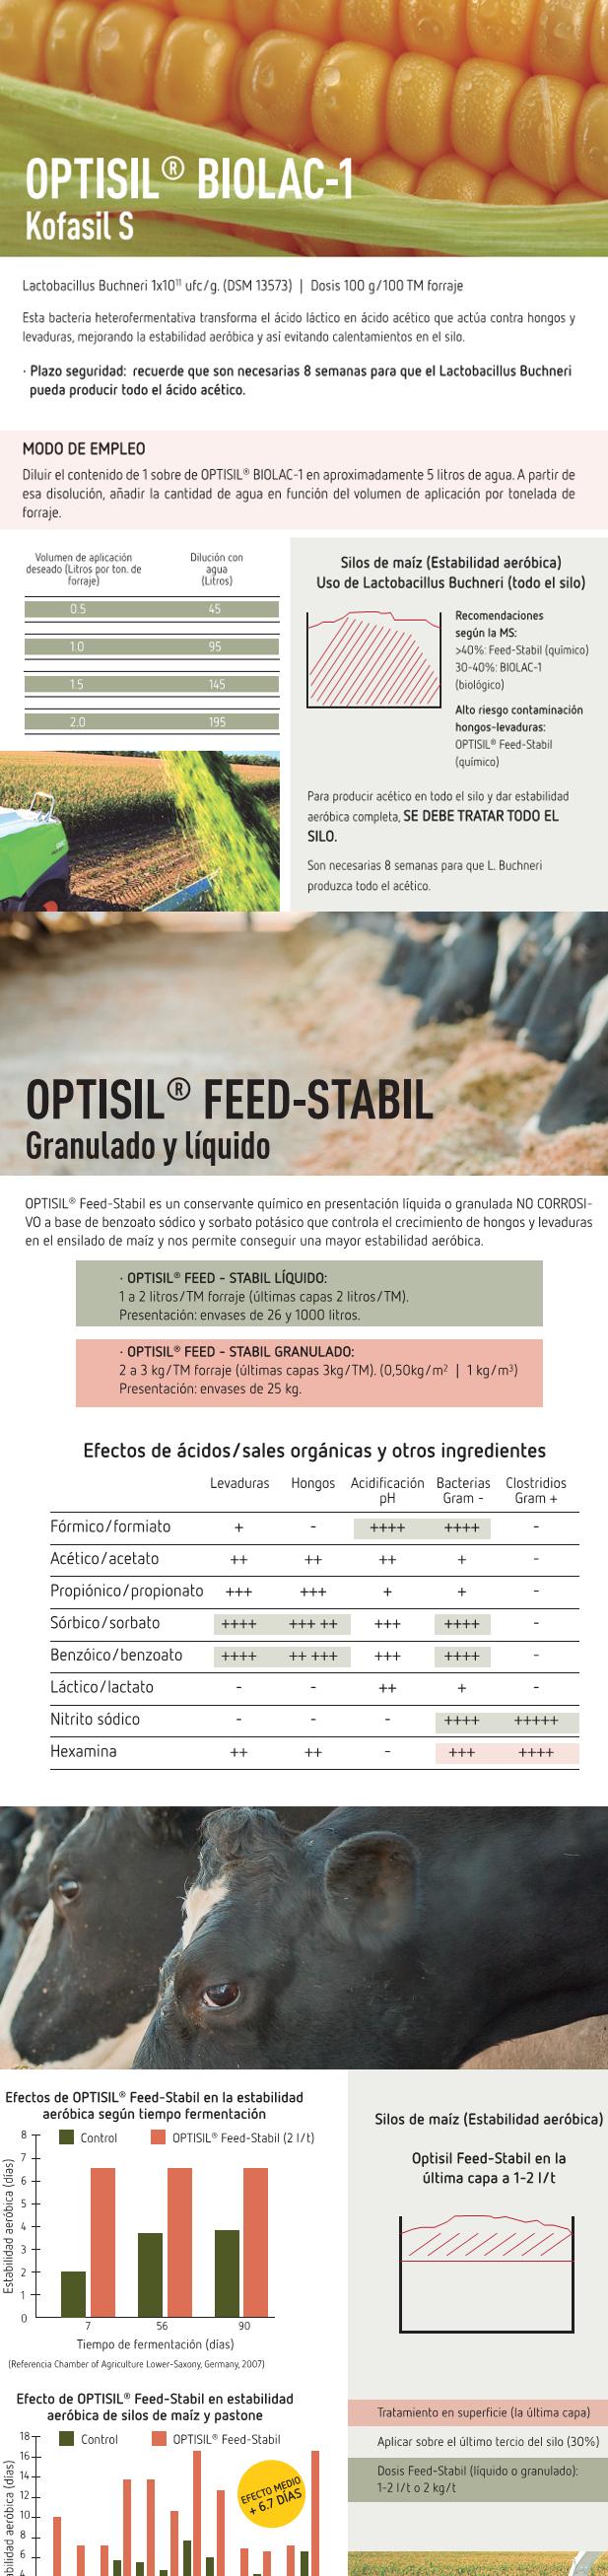 OPTISIL 19 2